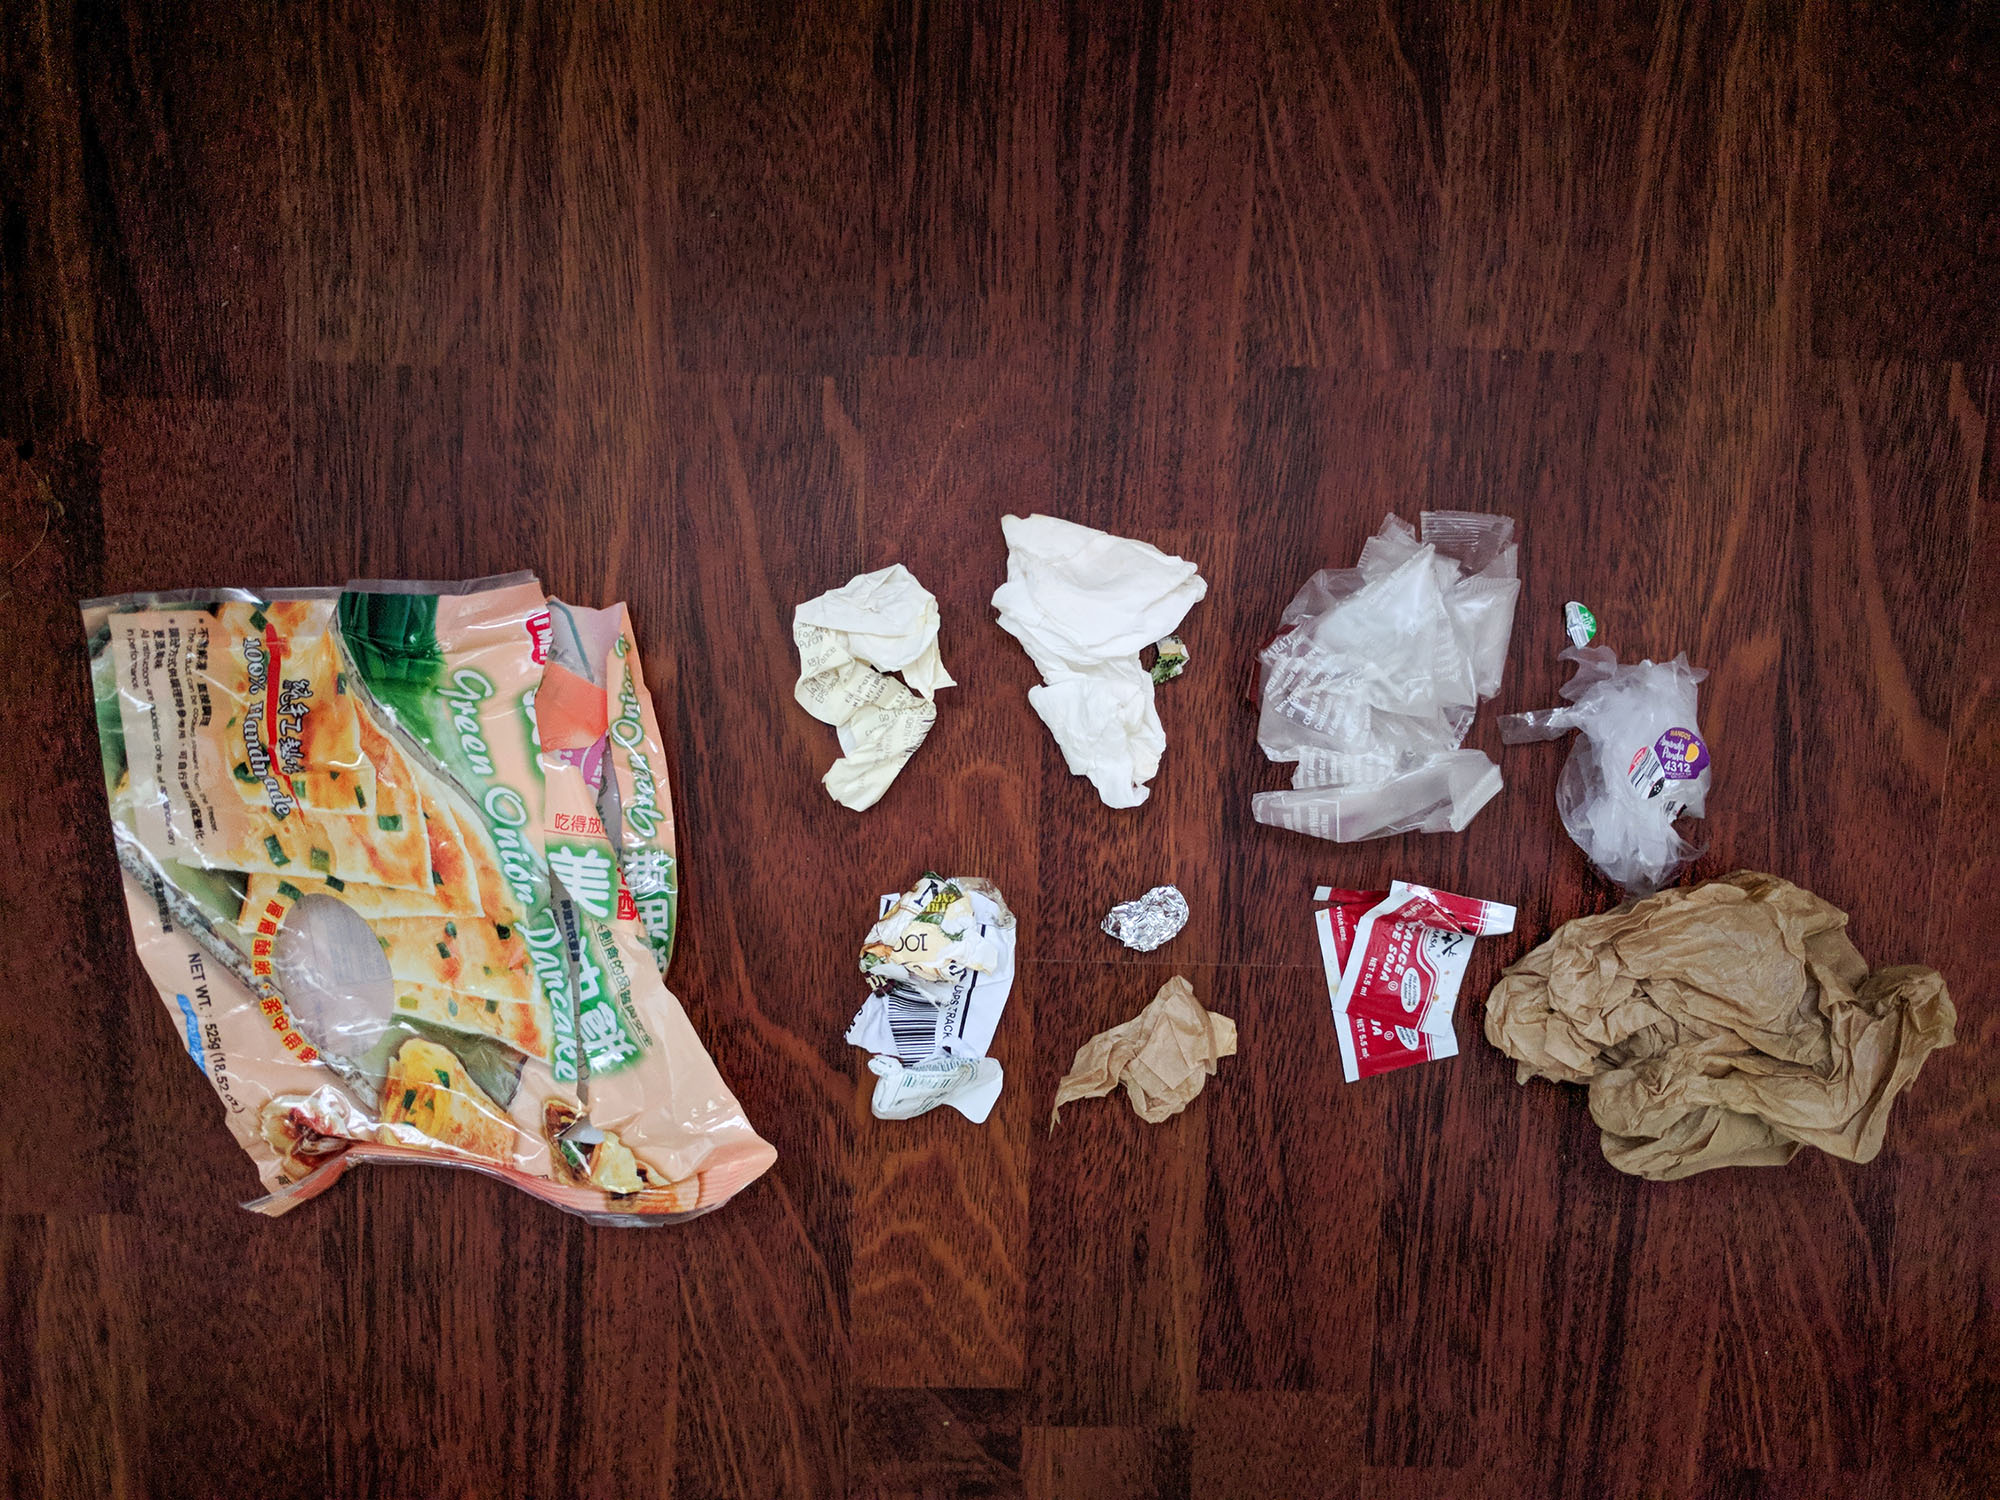 waste in a 12 oz mason jar day laid out